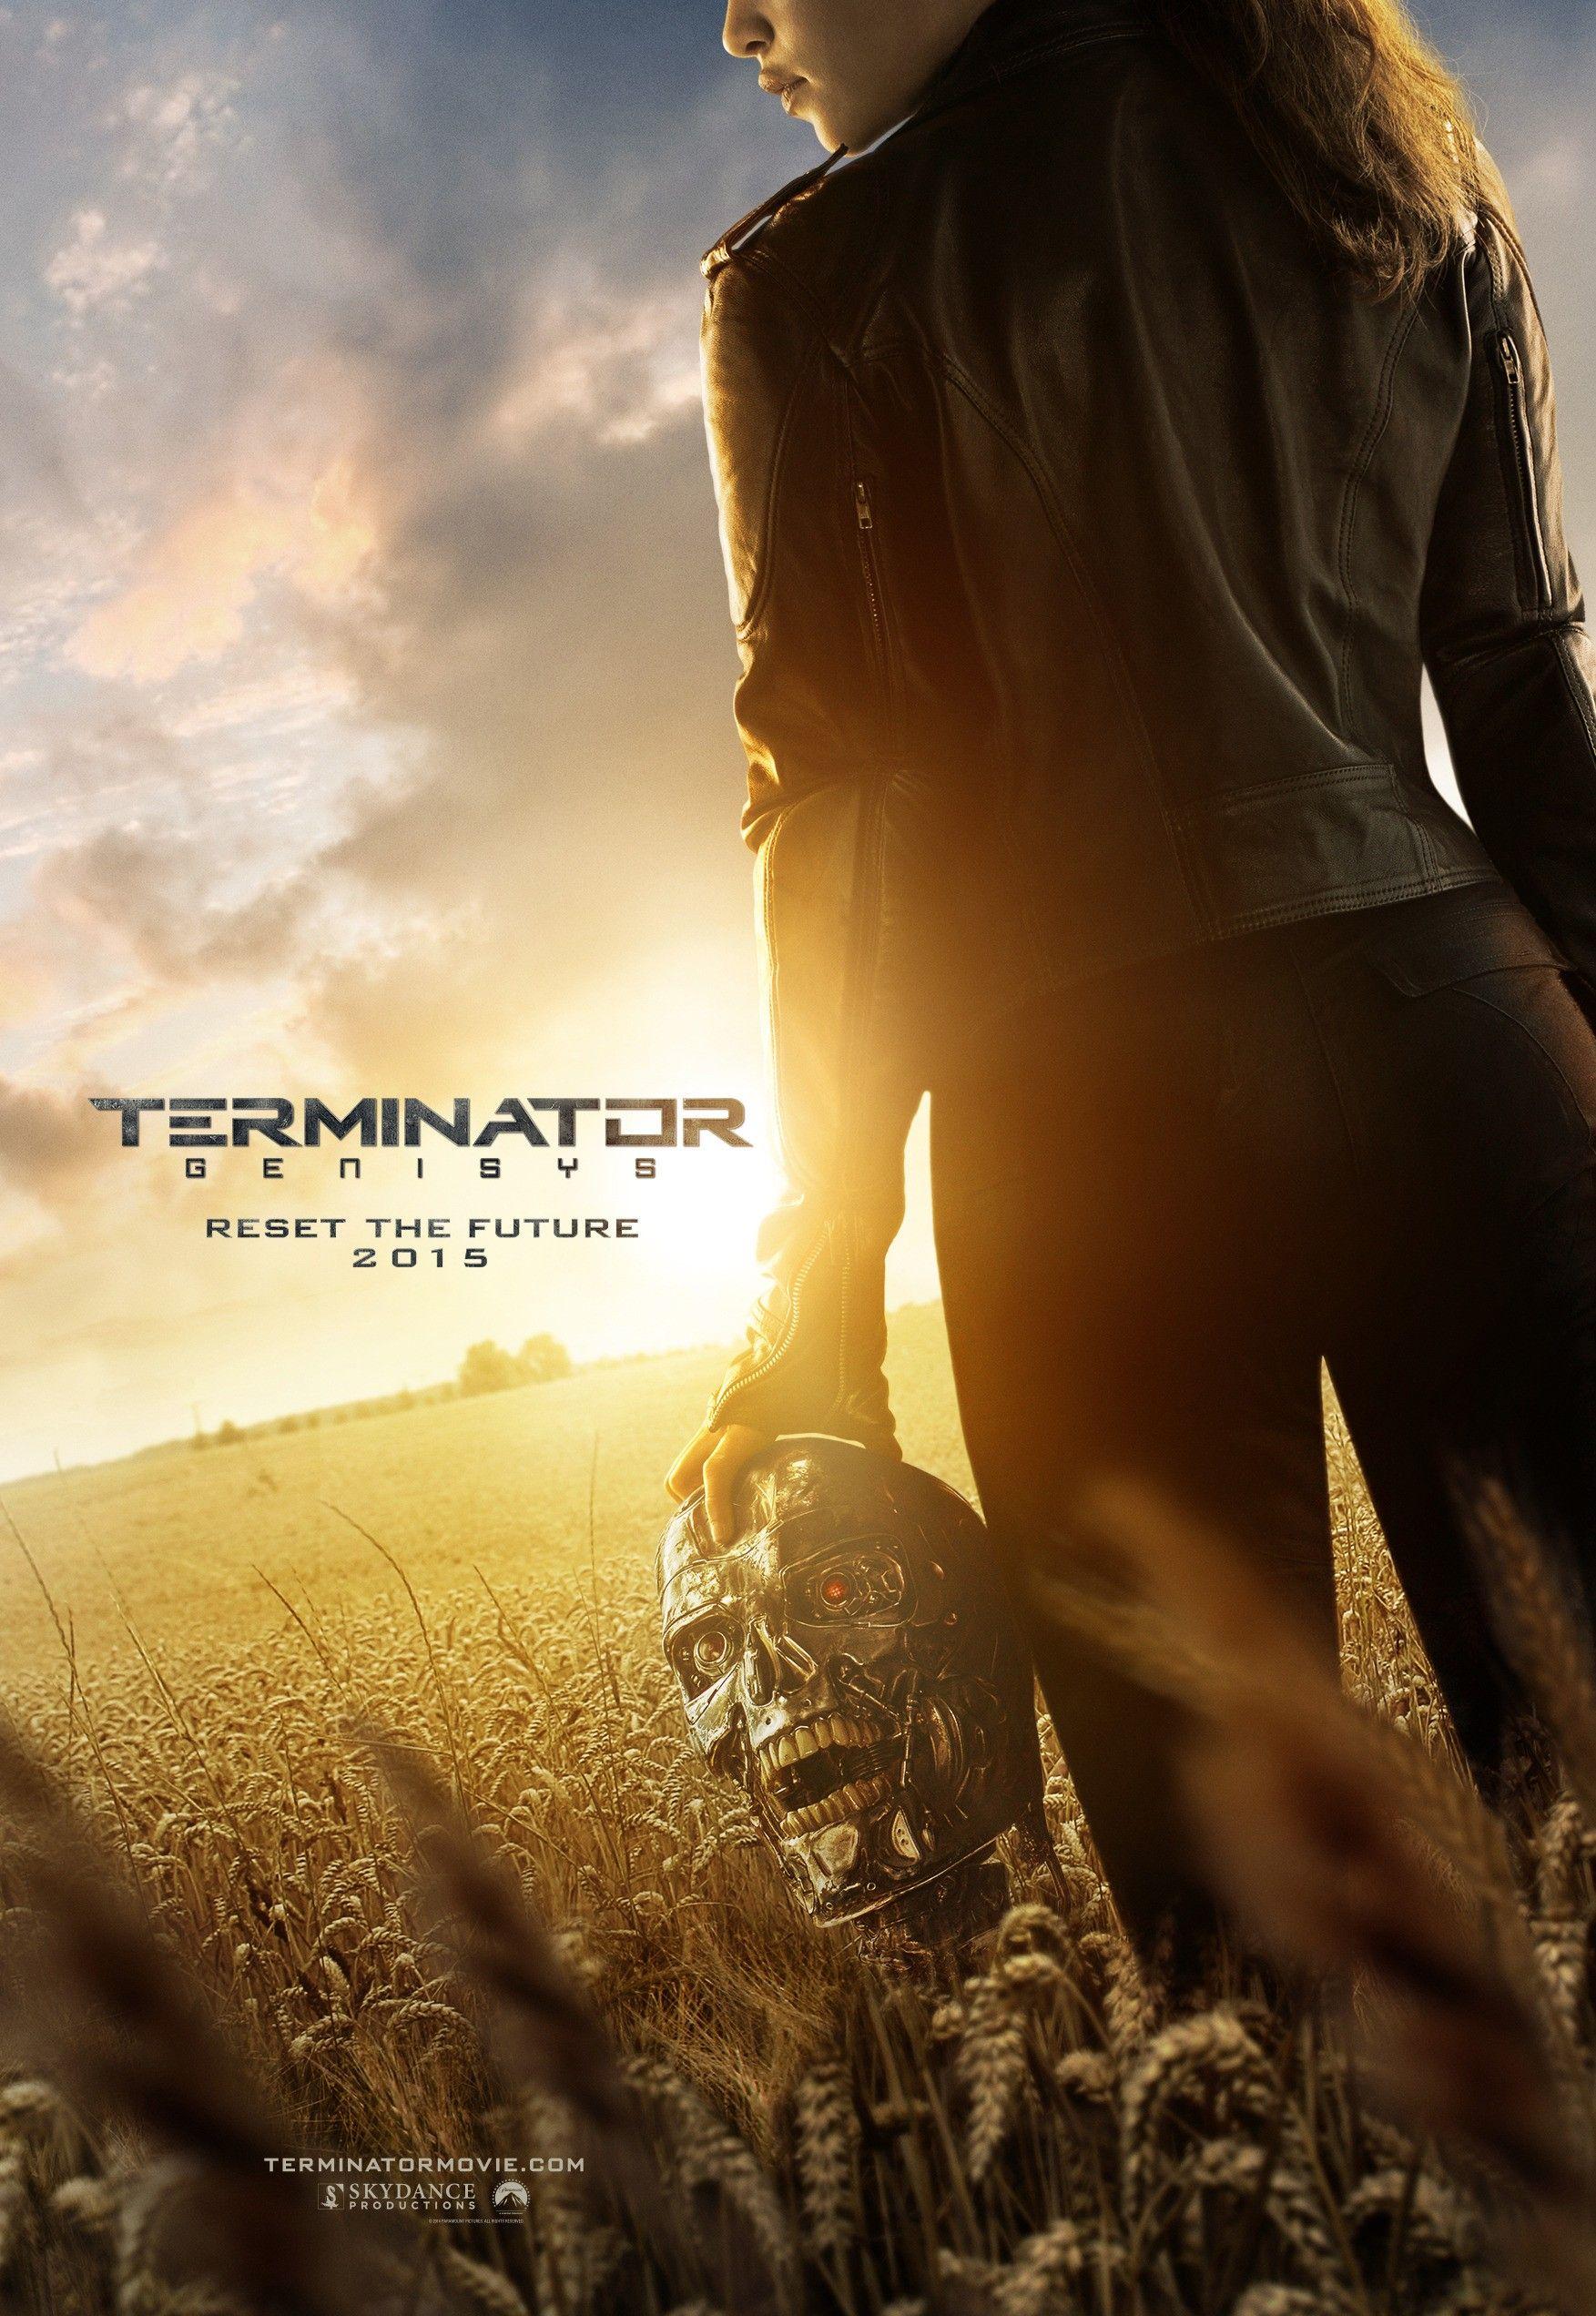 #TerminatorGenisys